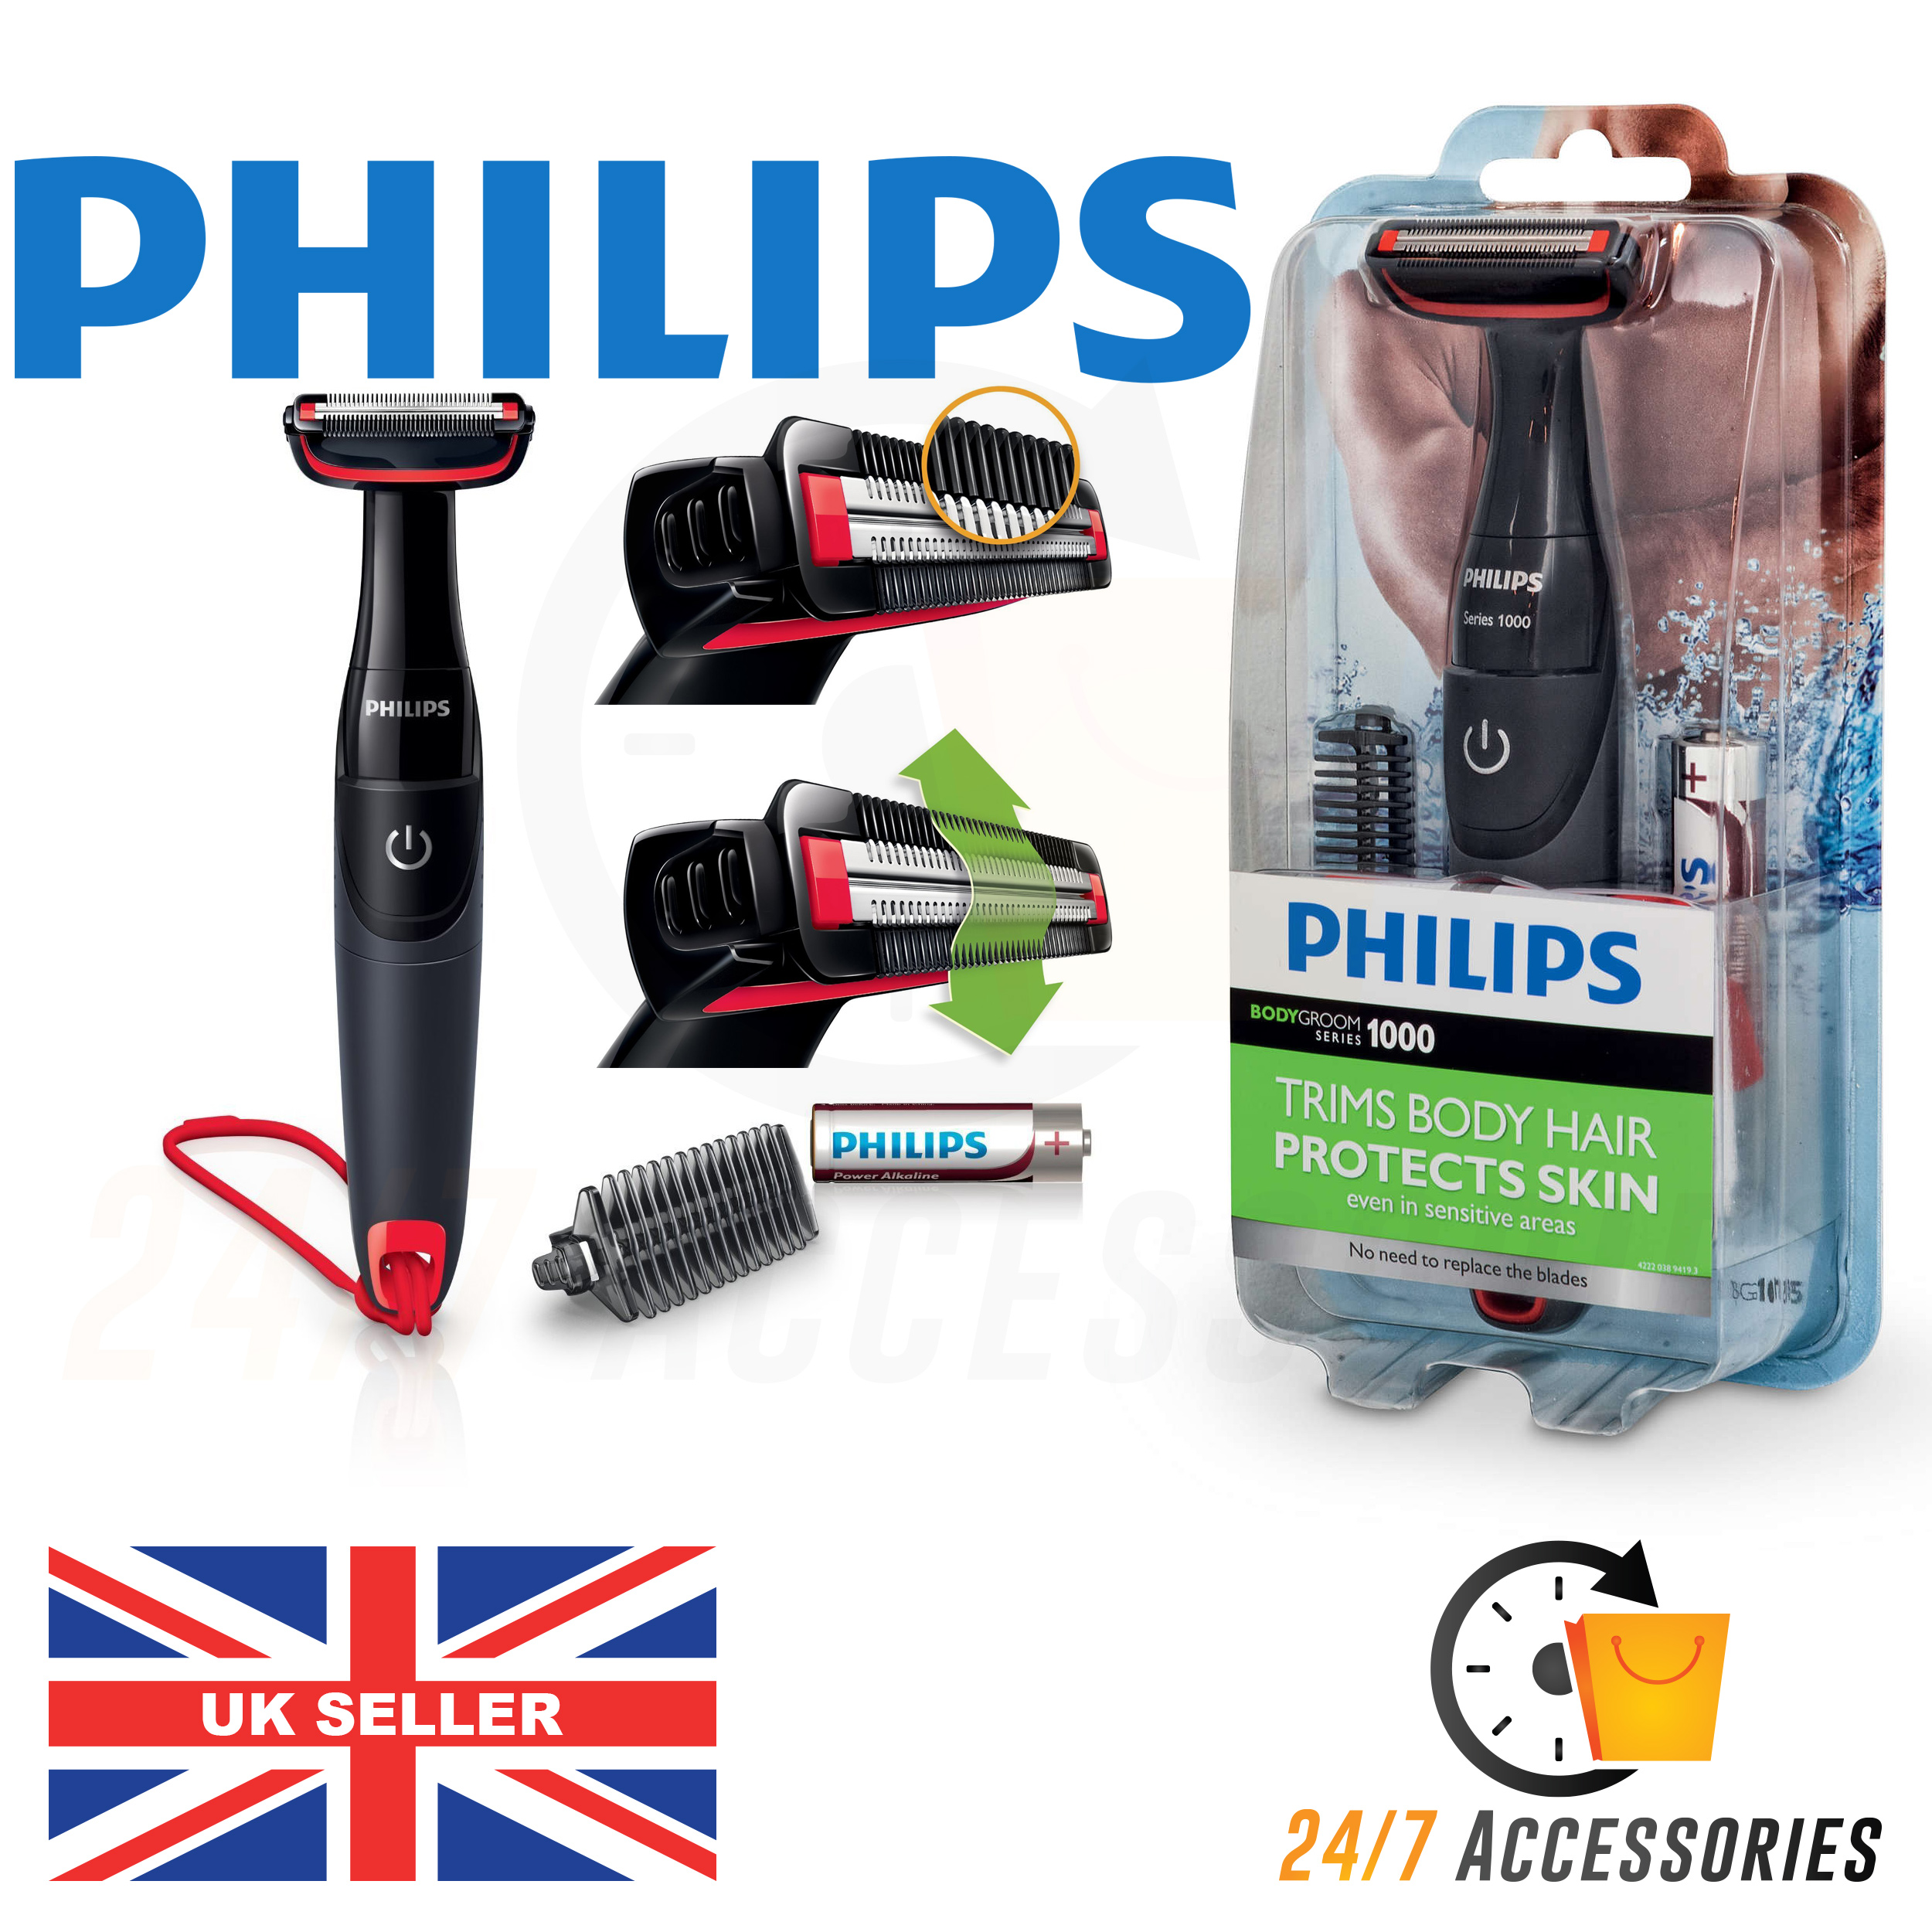 Philips bodygroom 1000